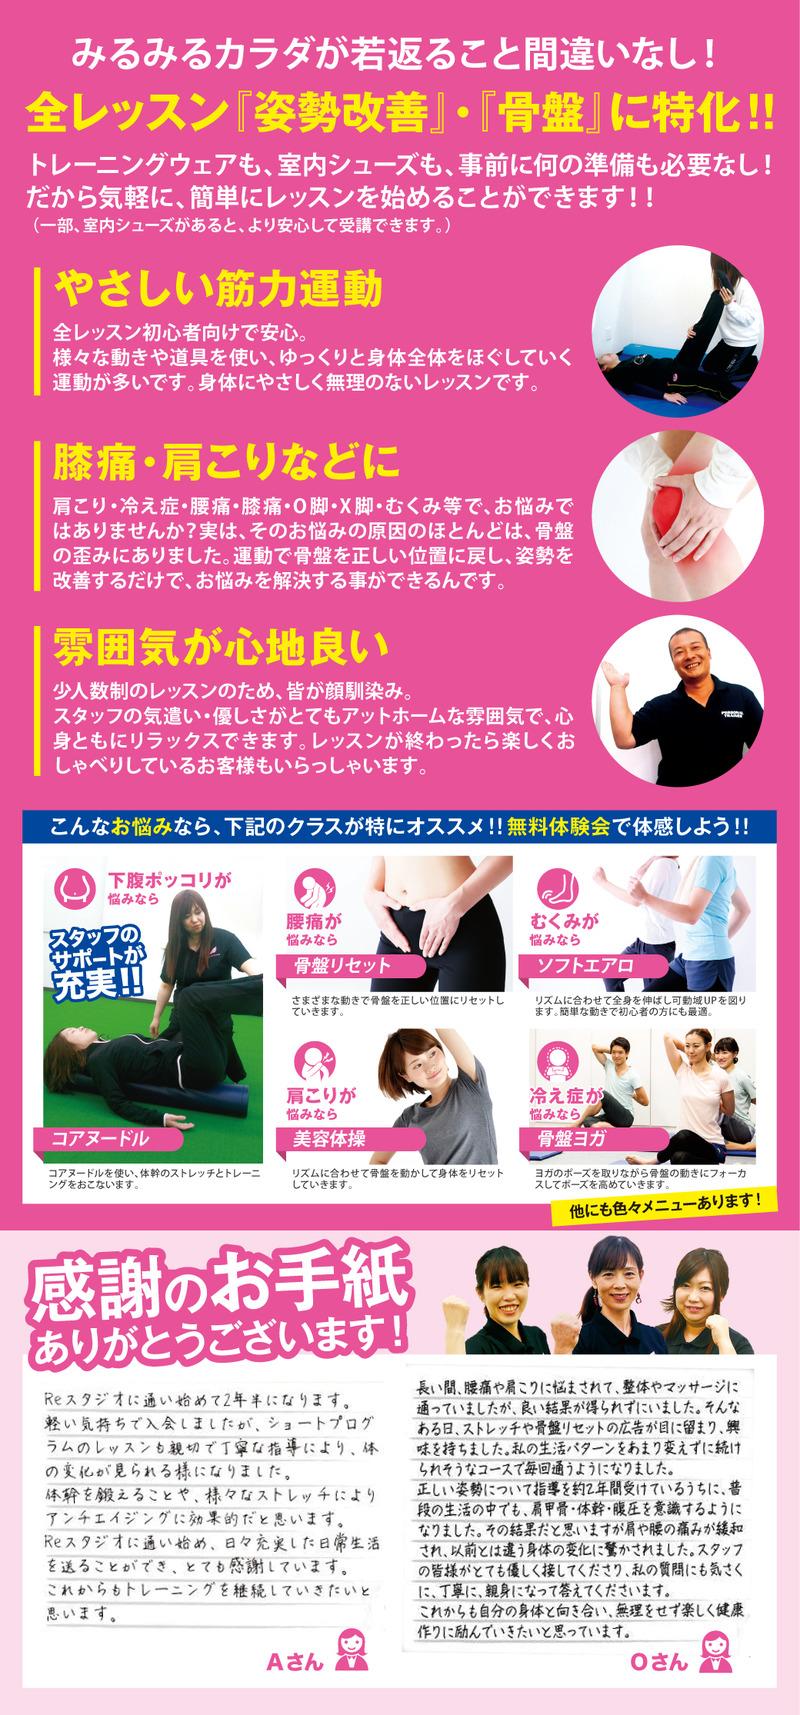 02_Re内容.jpg